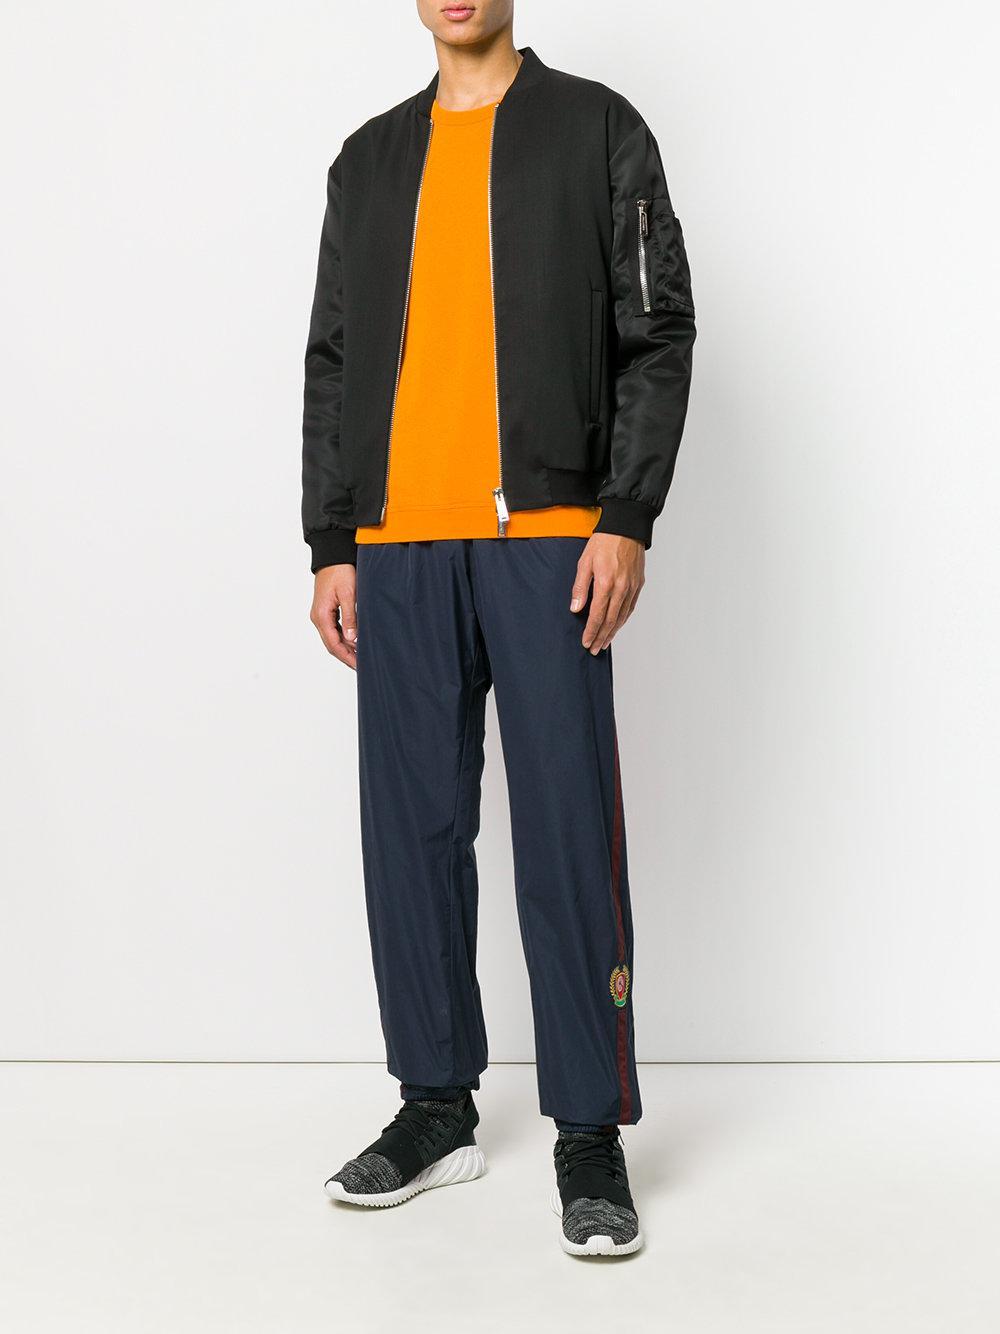 c7c58a0e3 Lyst - Yeezy Season 5 Crest Sweatpants in Blue for Men